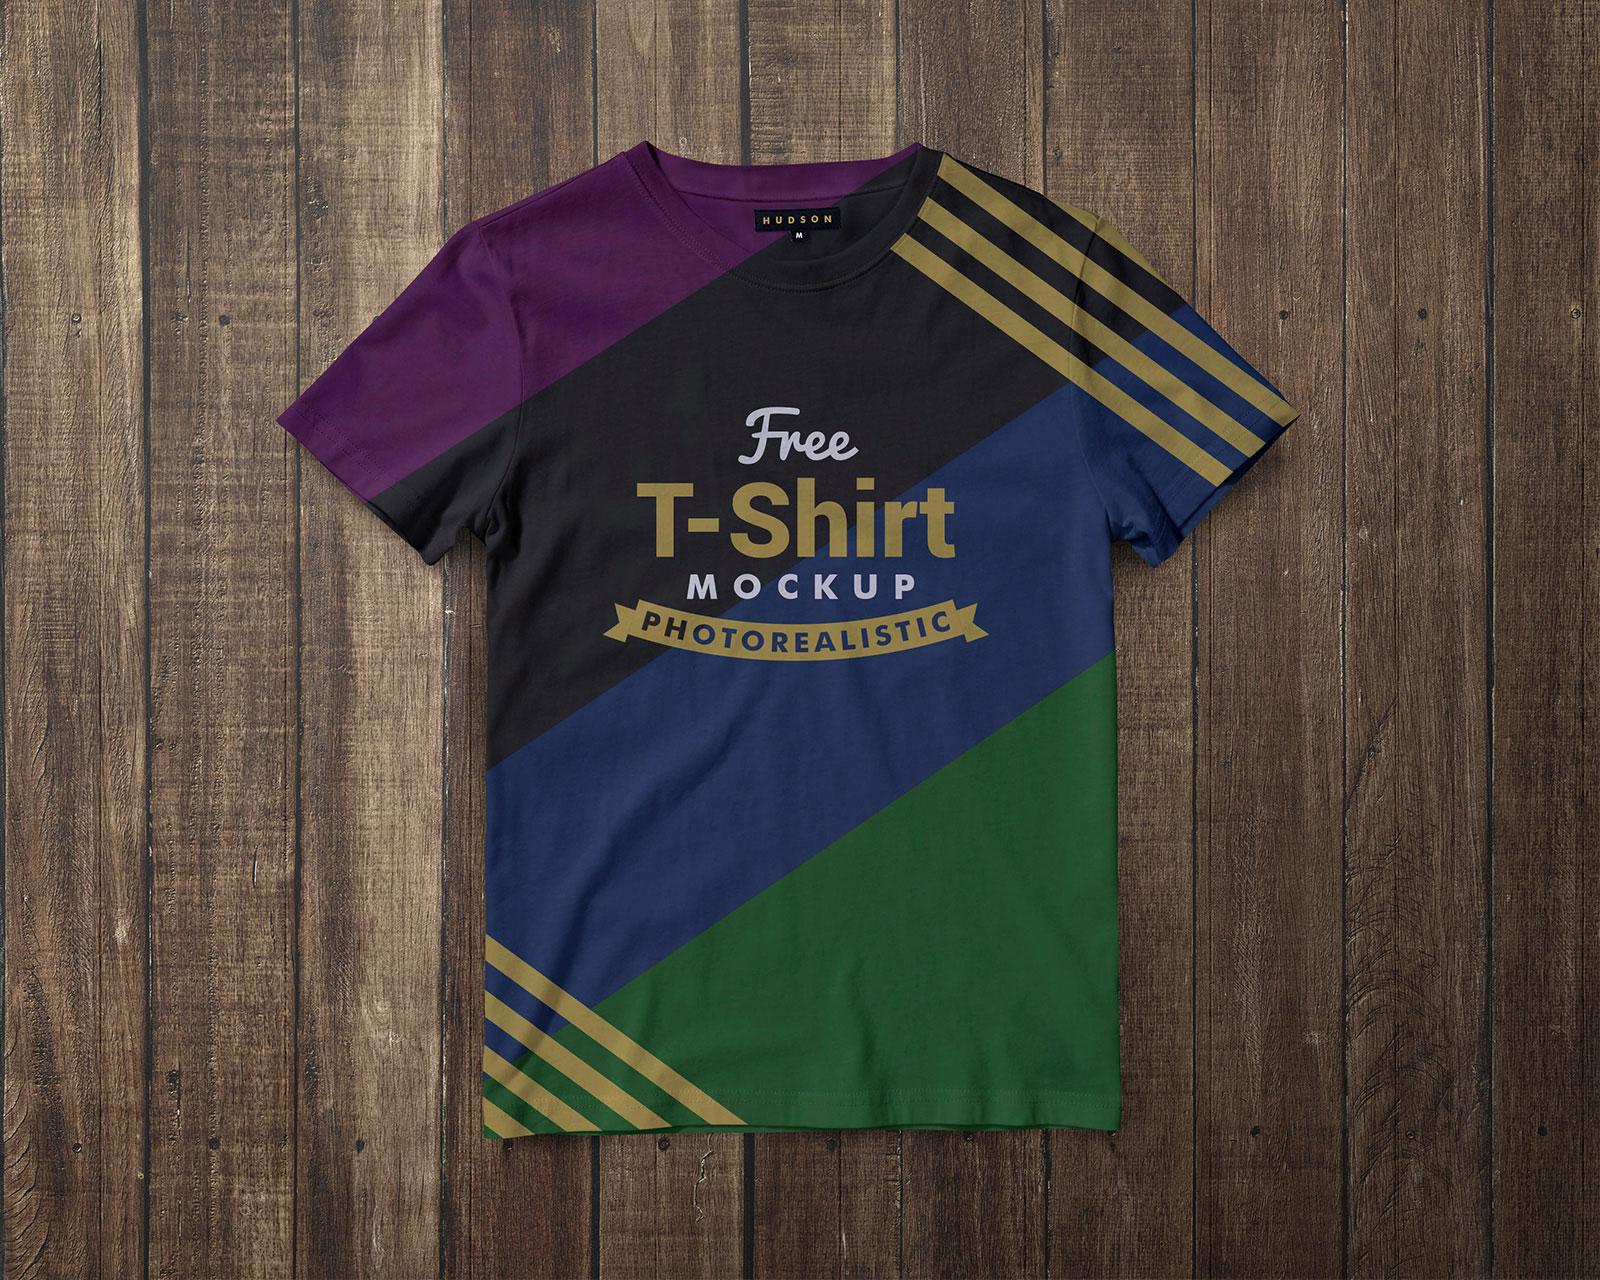 Free-Black-&-White-Half-Sleeves-T-Shirt-Mockup-PSD-1